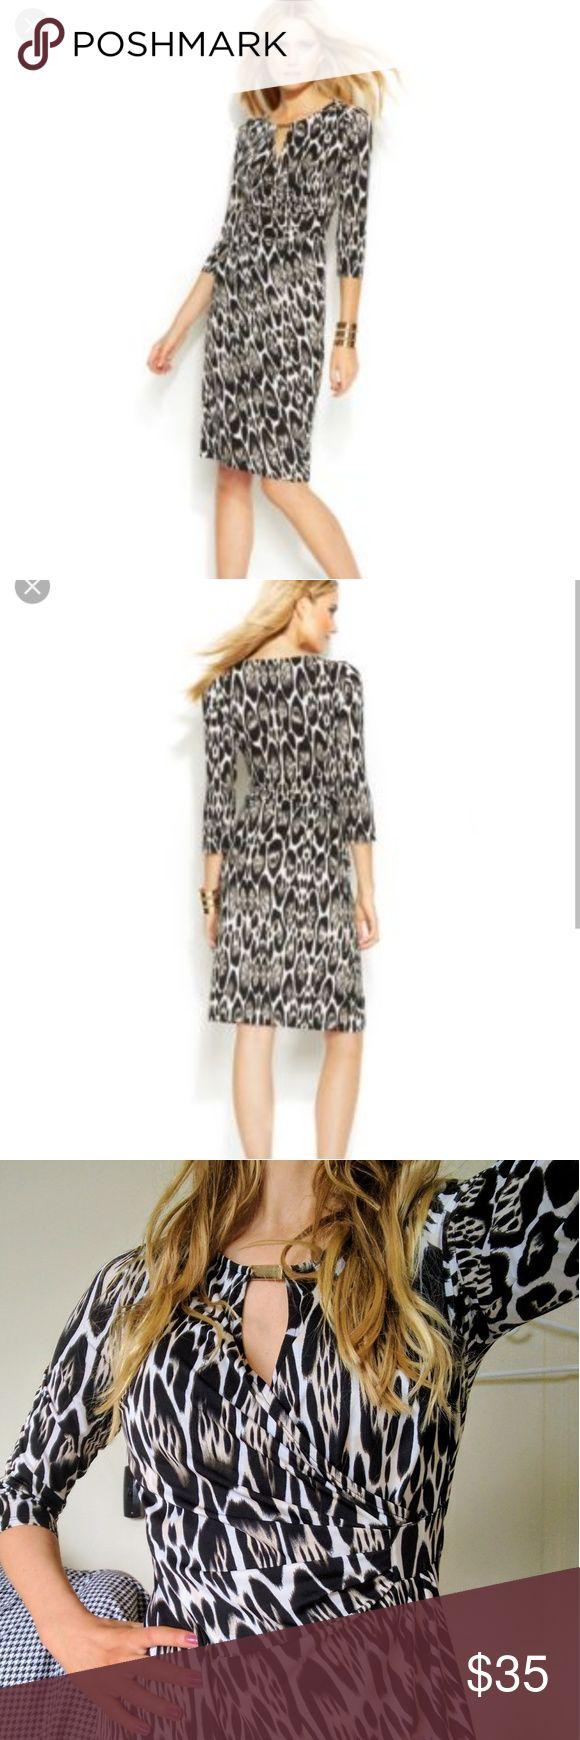 International Concepts long sleeve faux wrap dress Excellent condition faux wrap animal print dress. Polyester, spandex blend INC International Concepts Dresses Long Sleeve